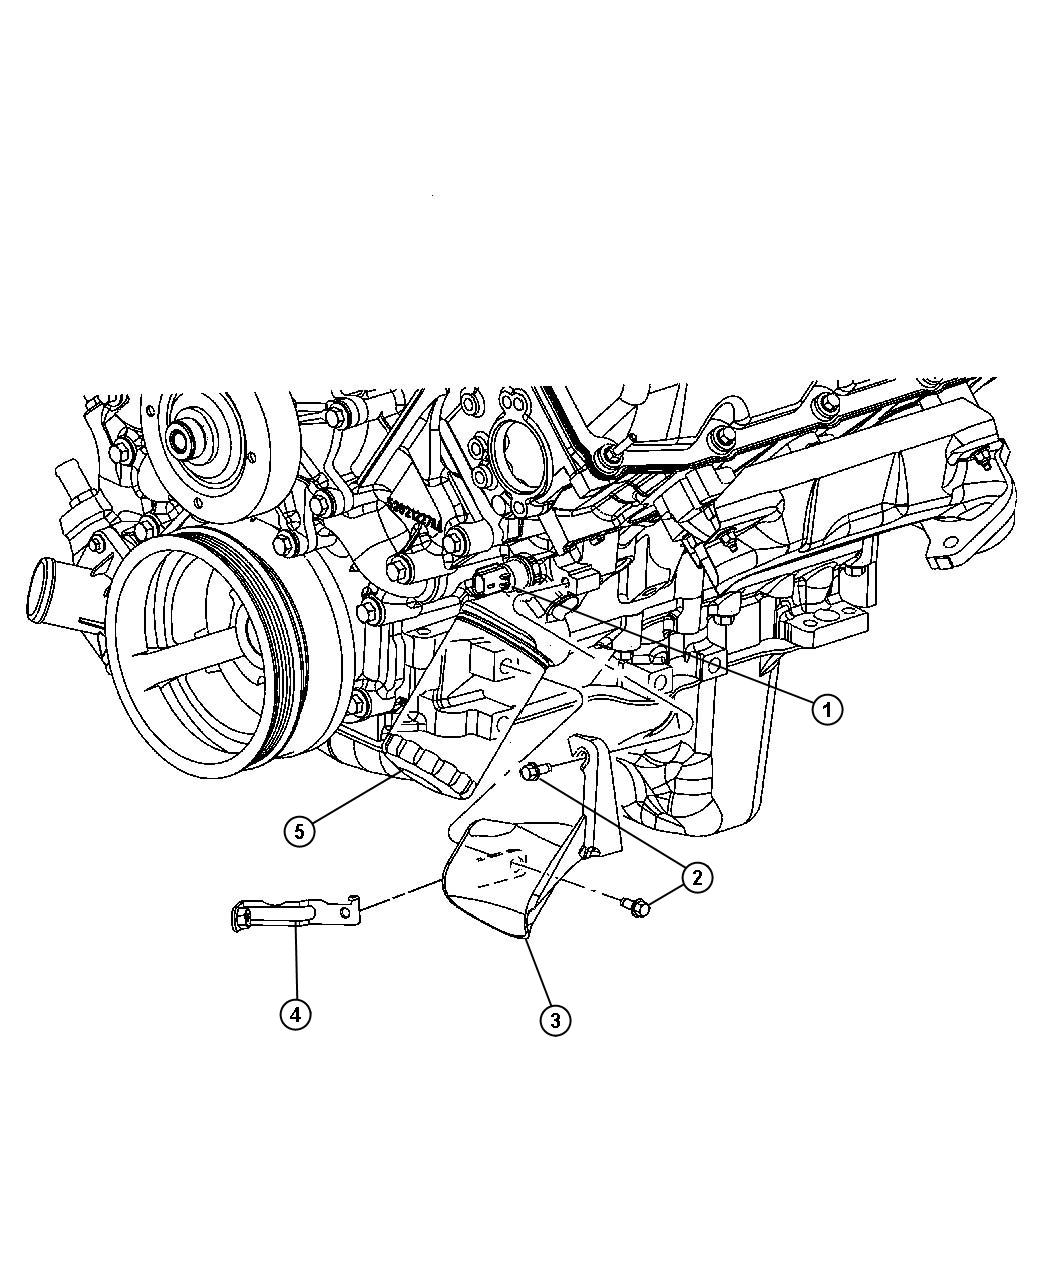 Jeep Grand Cherokee Laredo 4x4 4 7l V8 Ffv 5 Spd